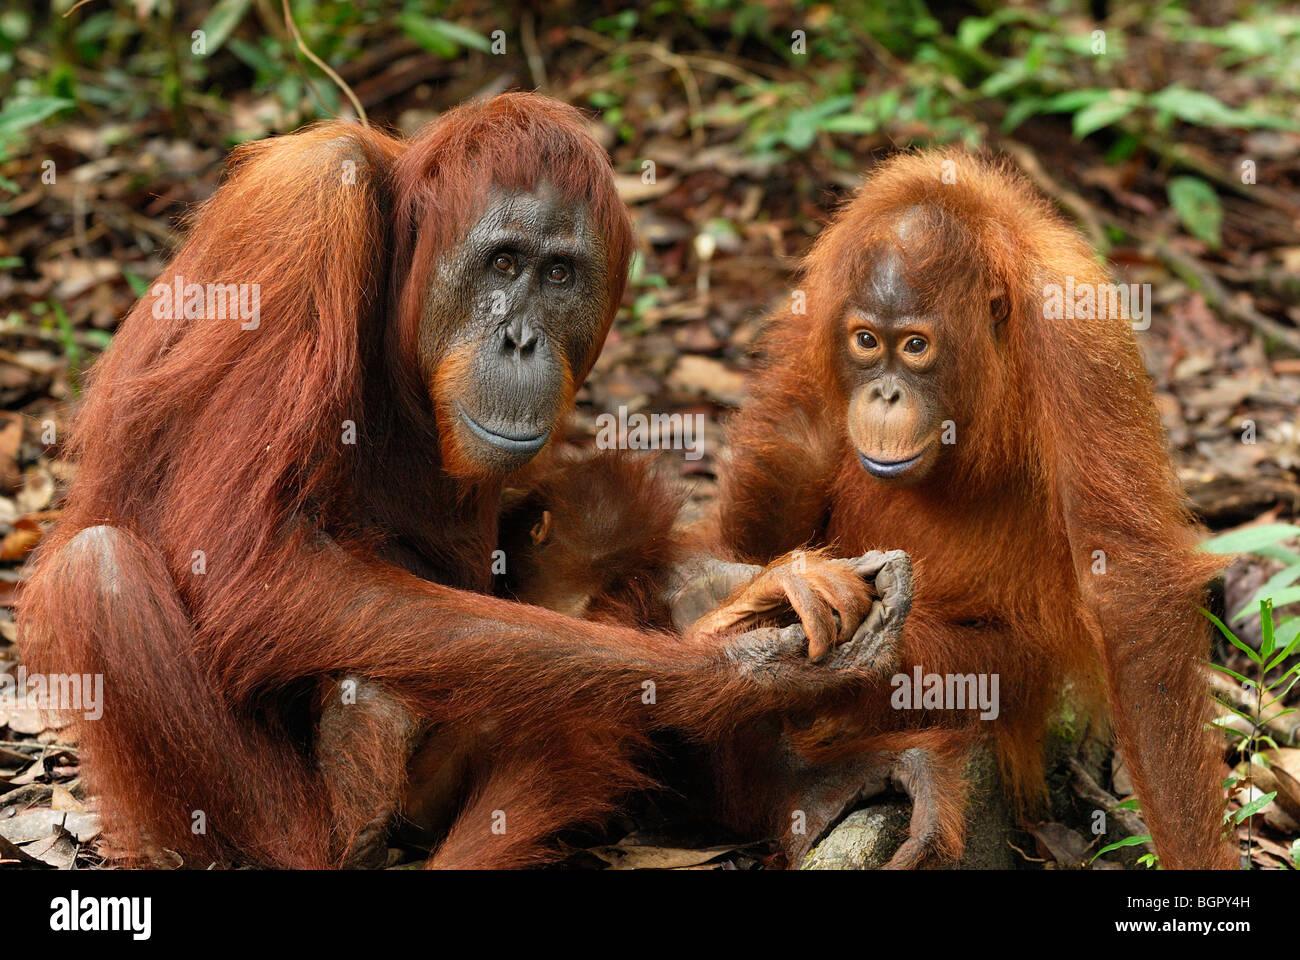 Borneo Orangutan (Pongo pygmaeus), femmina con un bambino, Camp Leaky, Tanjung messa National Park, Kalimantan, Immagini Stock